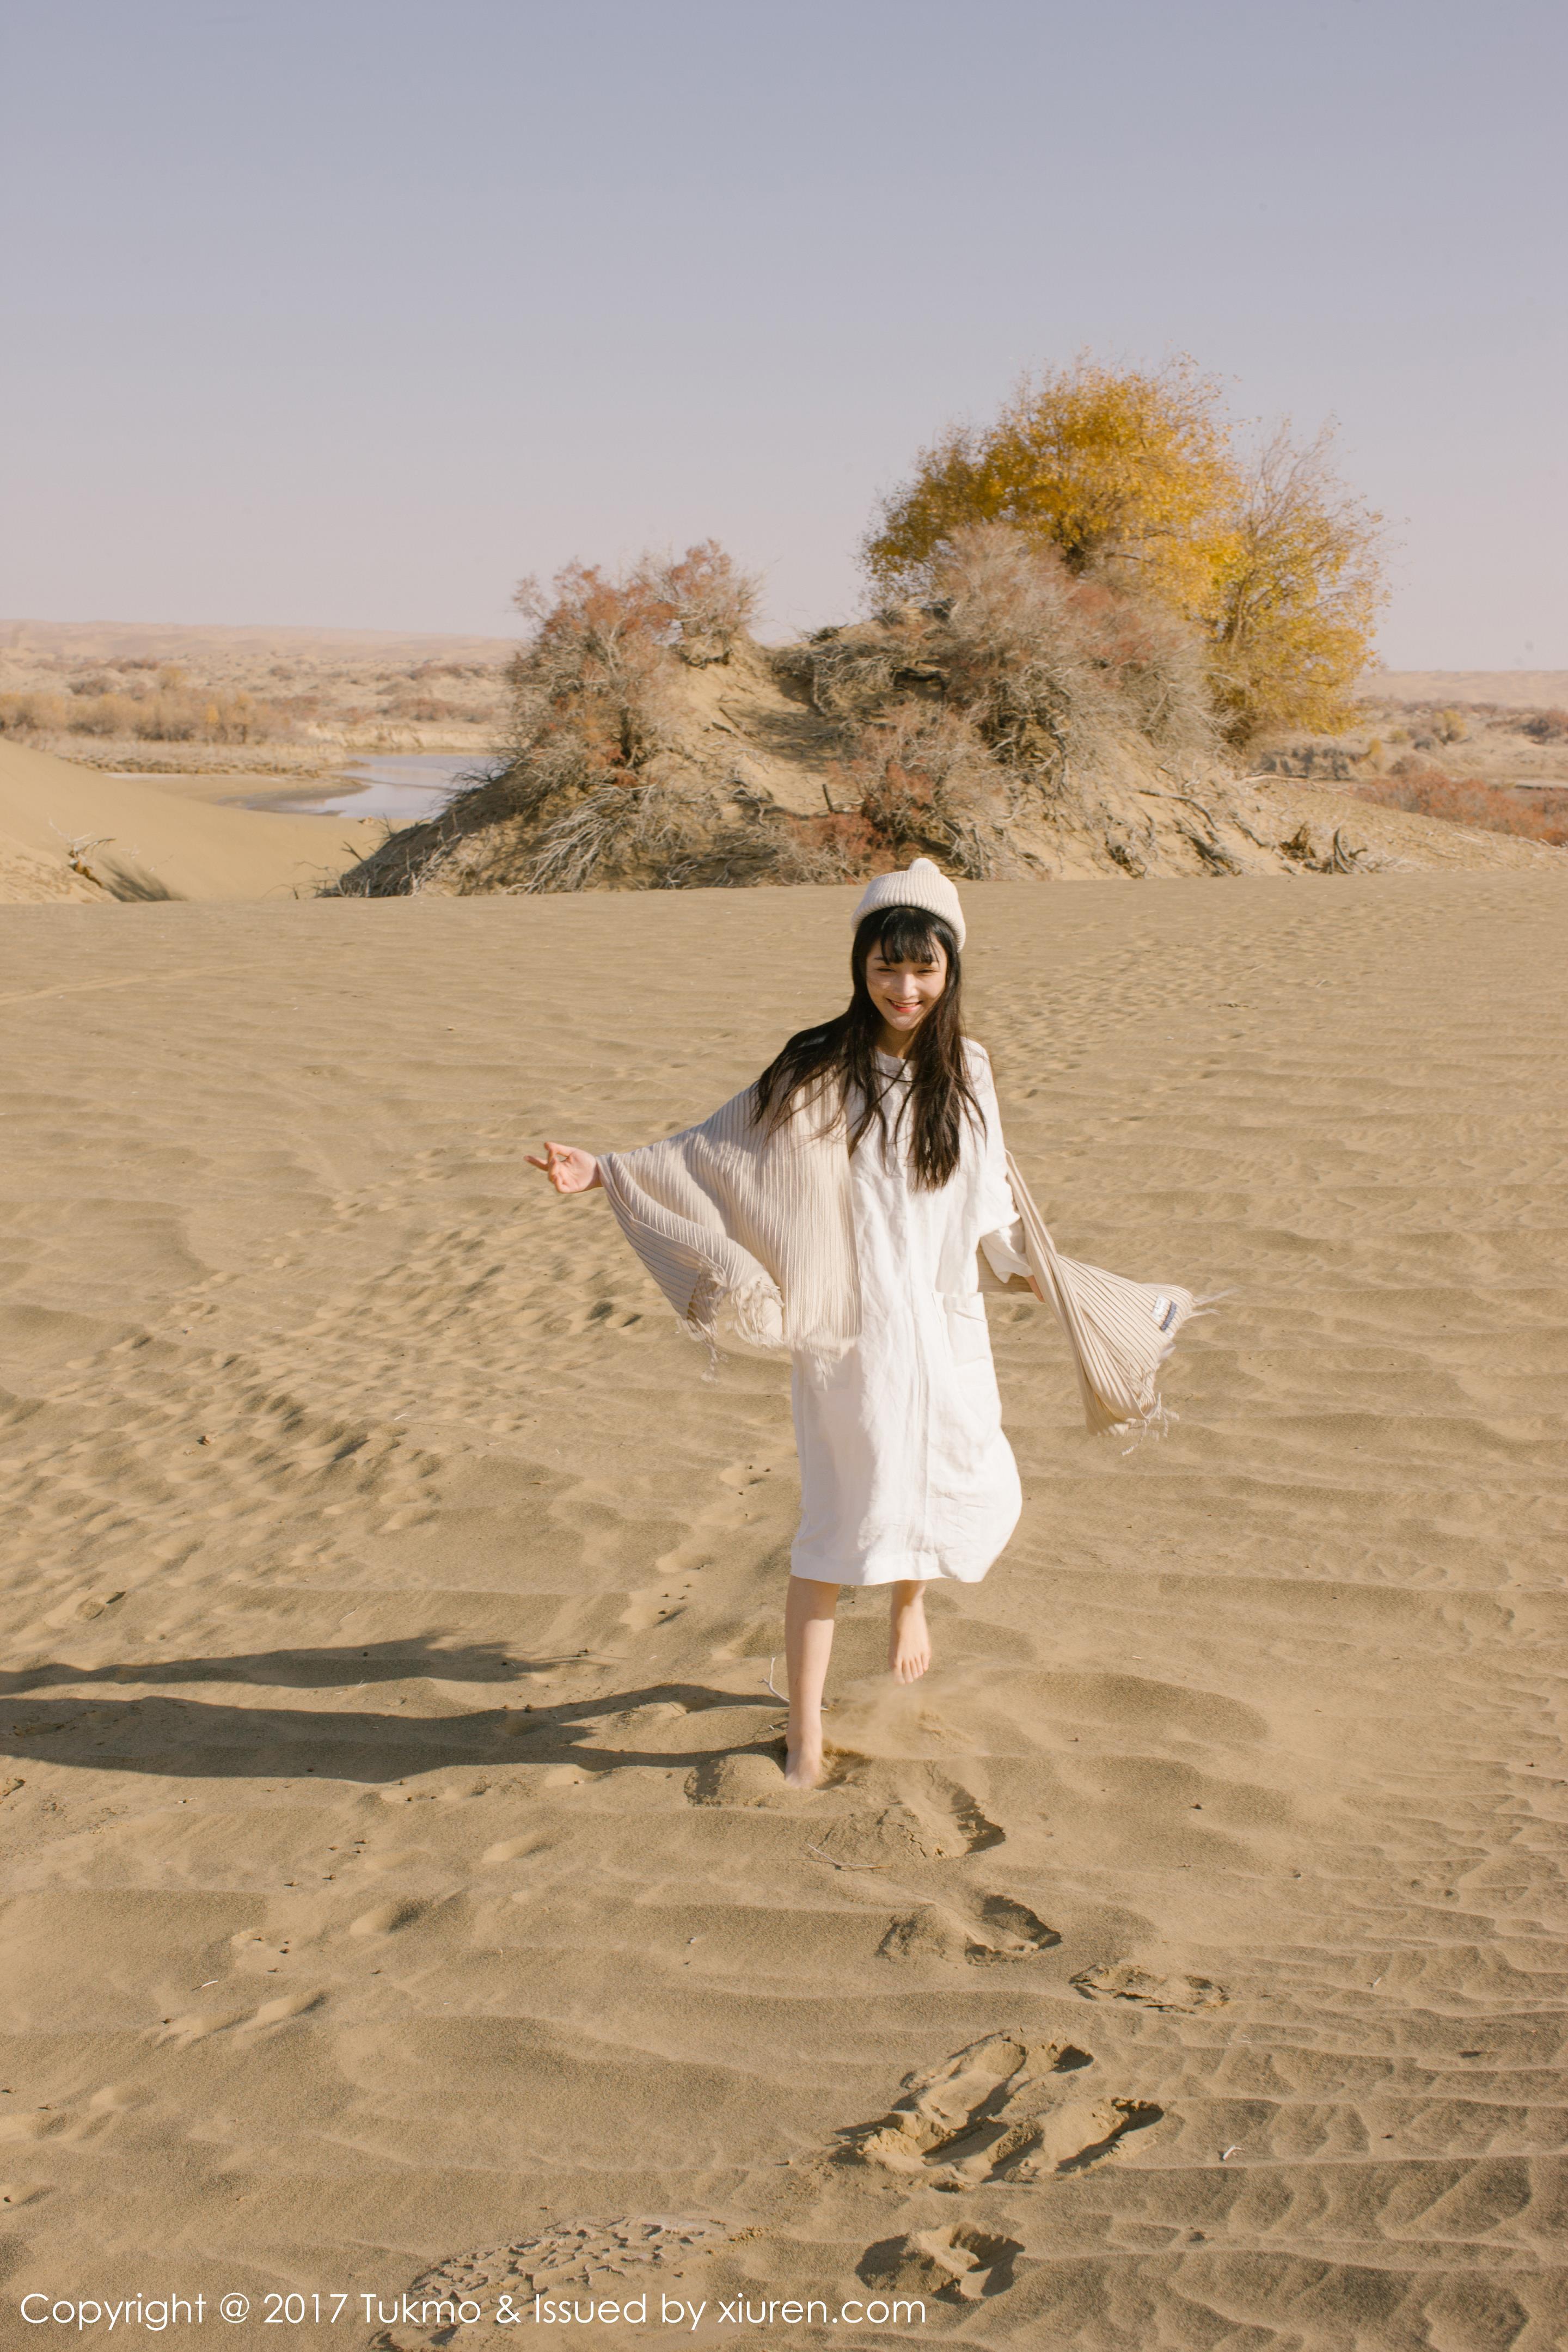 [Tukmo兔几盟]TKM20170914VOL0102 清纯可爱小萝莉 之应 白色连衣裙戈壁沙漠私房写真集